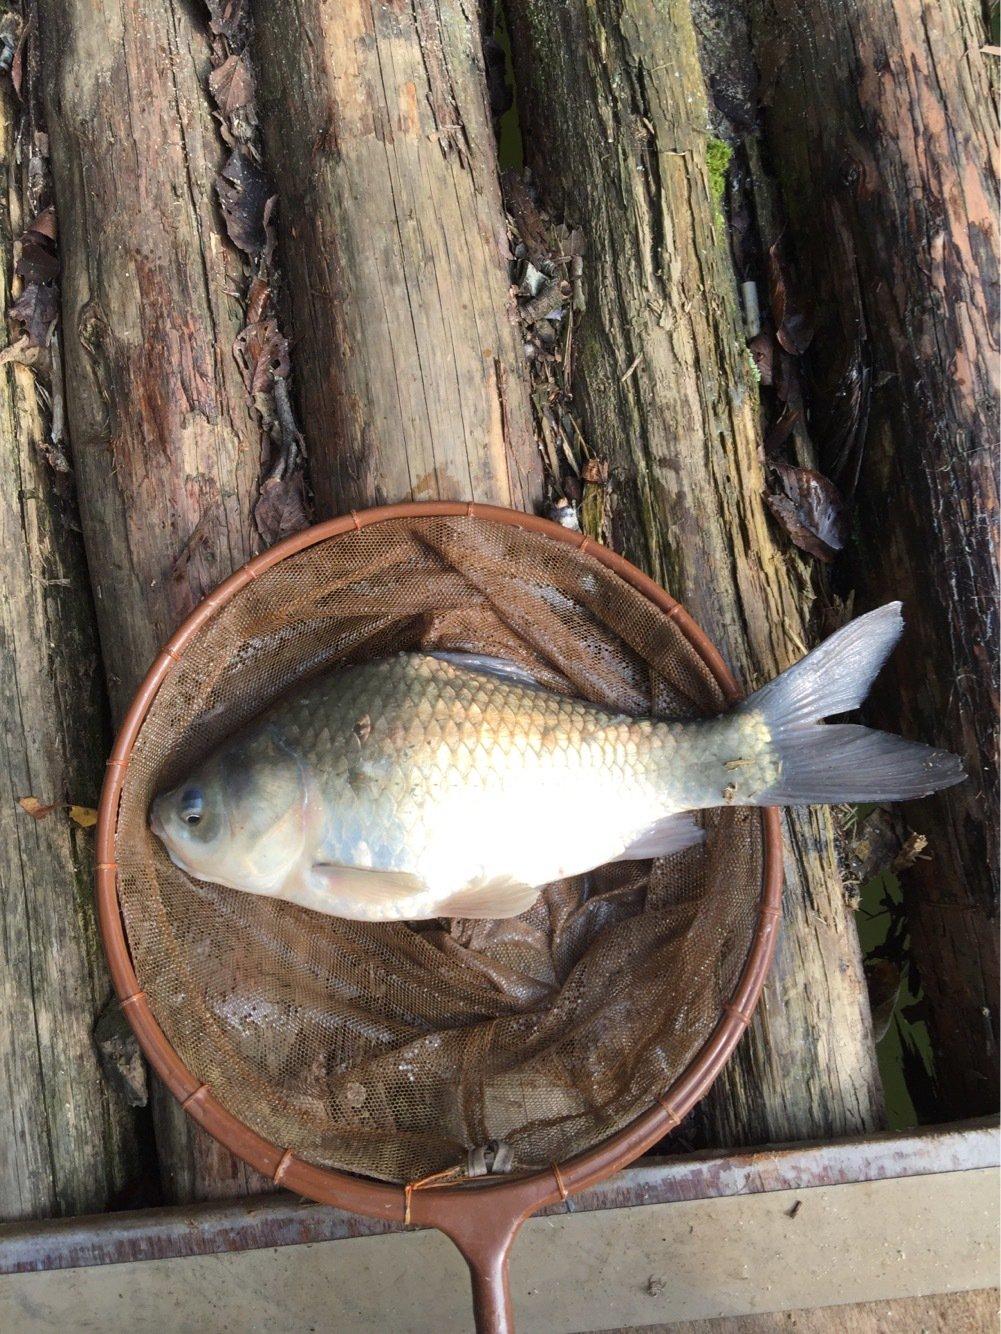 maverickさんの投稿画像,写っている魚はヘラブナ